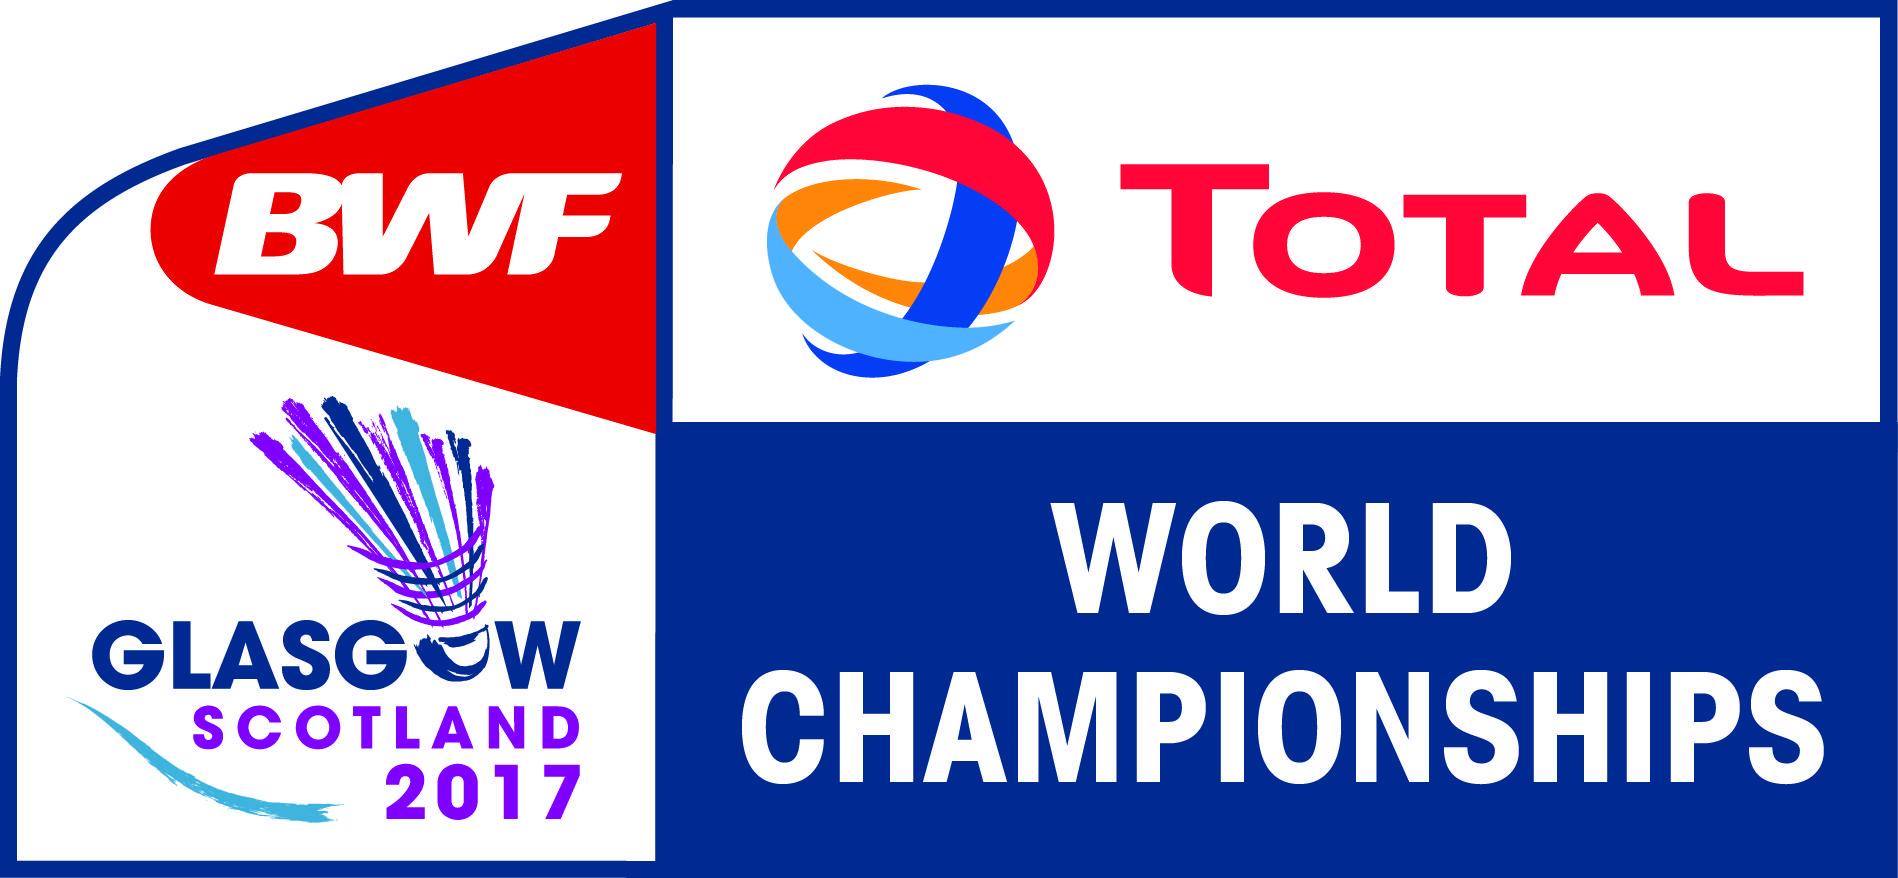 2017 Badminton World Championships Volunteer